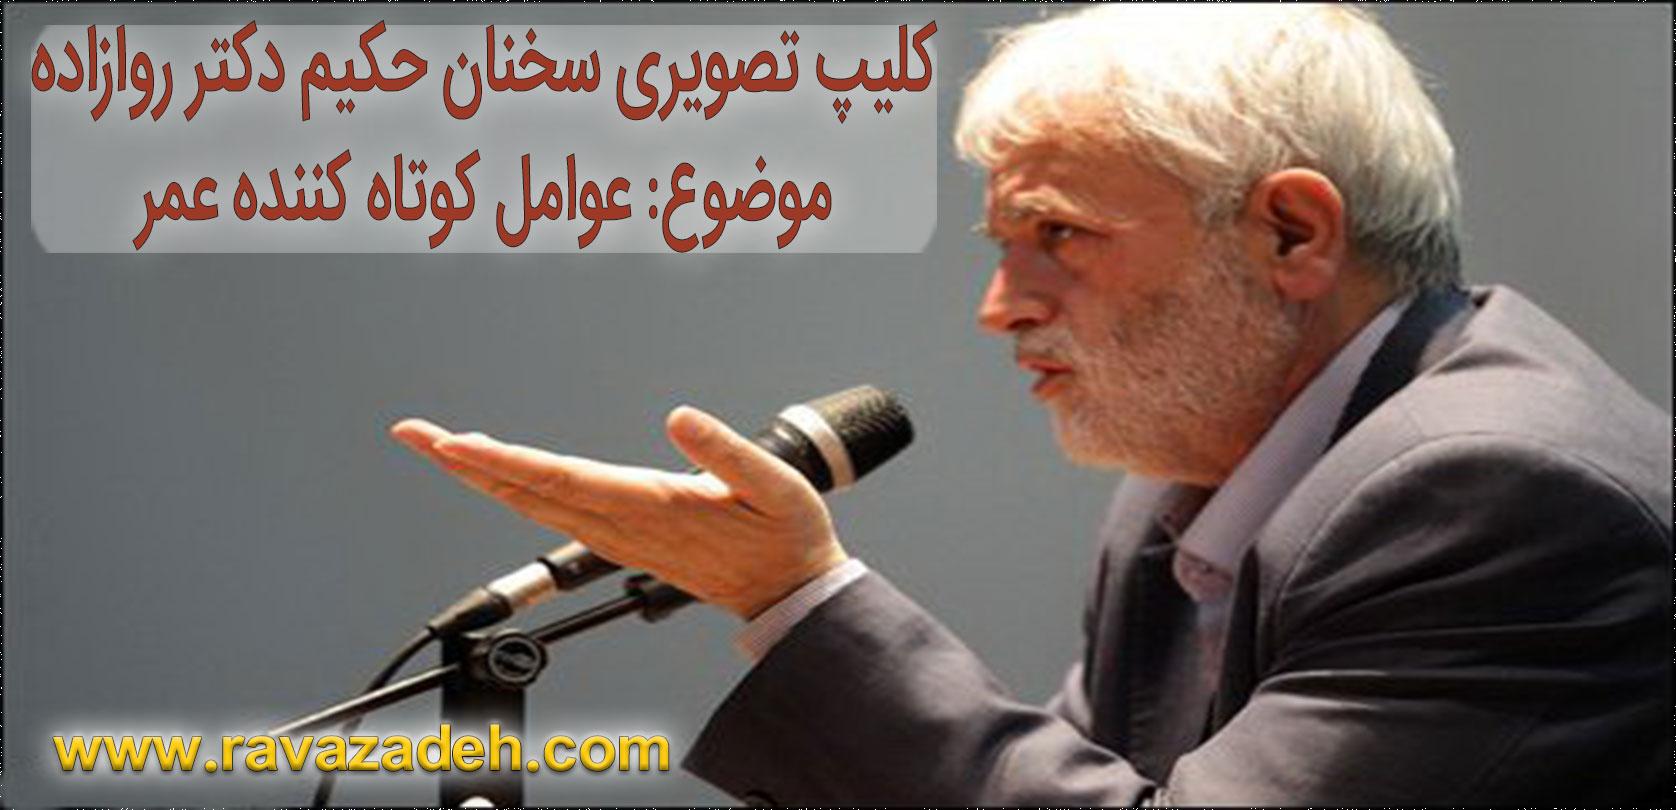 Photo of عوامل کوتاه کننده عمر + کلیپ تصویری سخنرانی حکیم دکتر روازاده